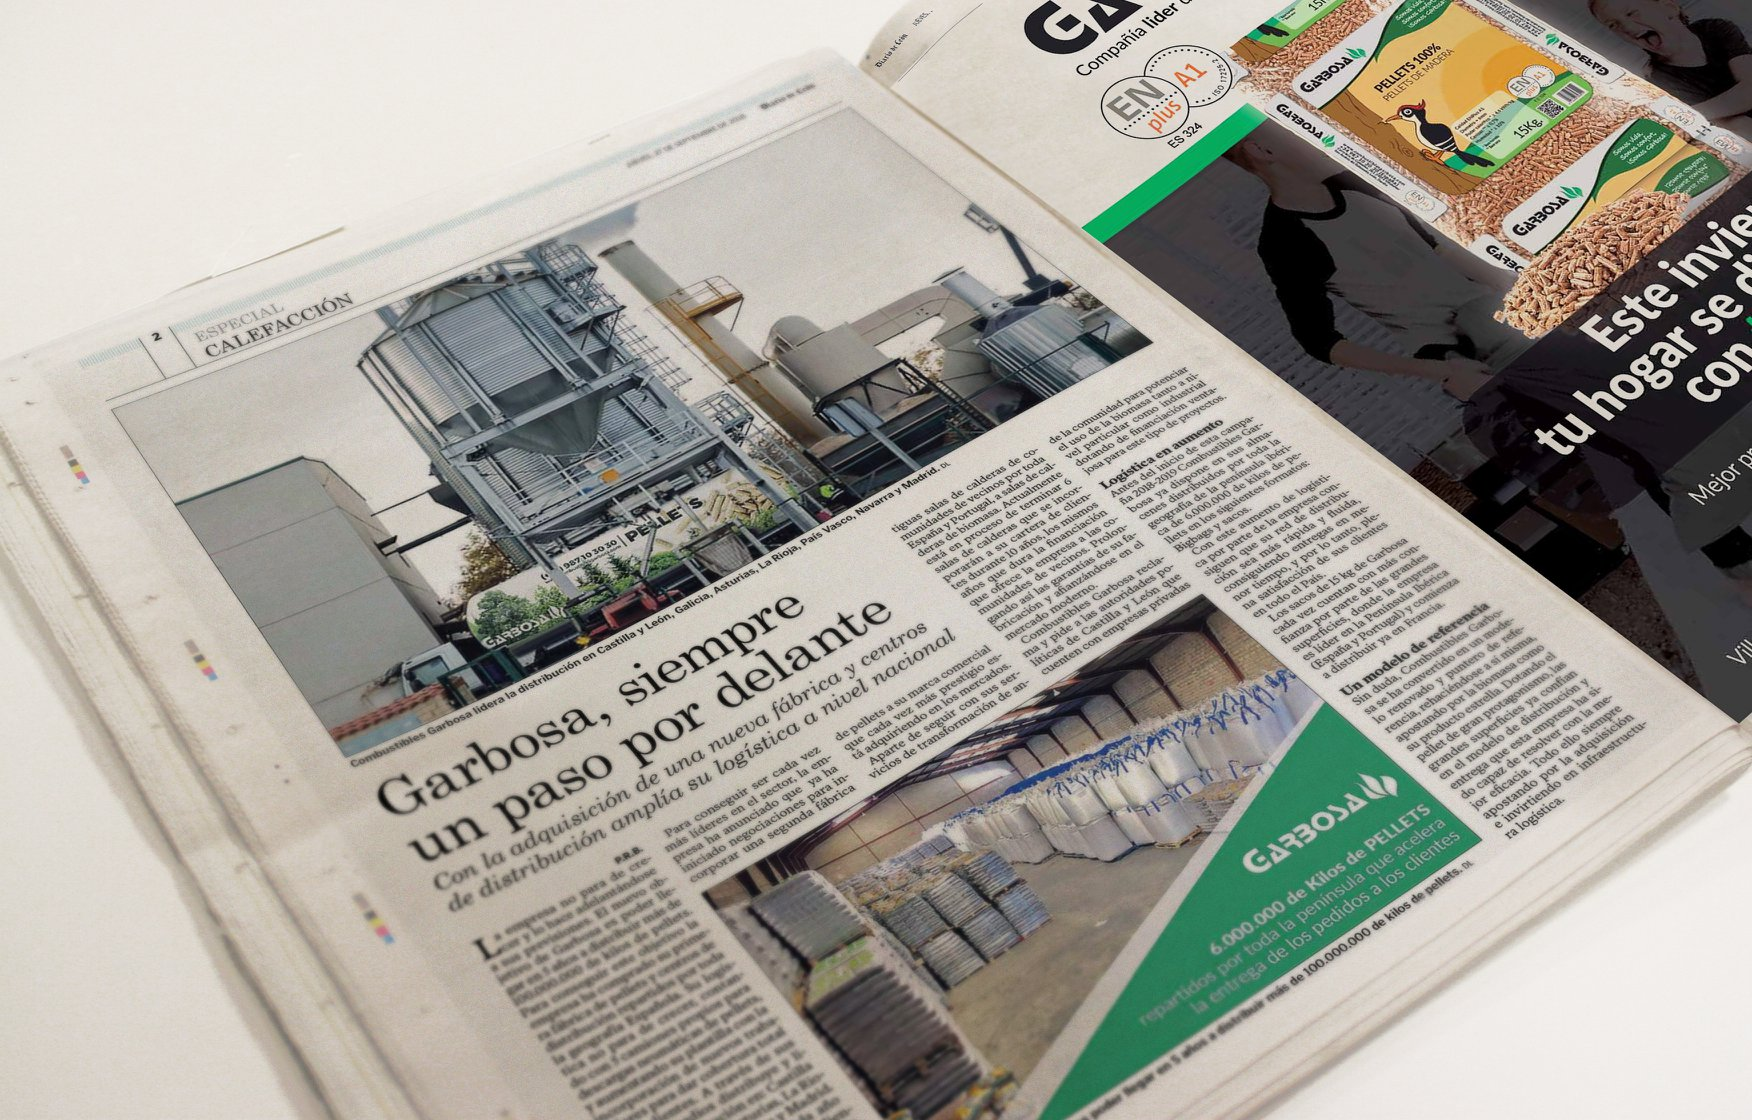 Combustibles Garbosaes la empresa de referencia en el sector del pellets